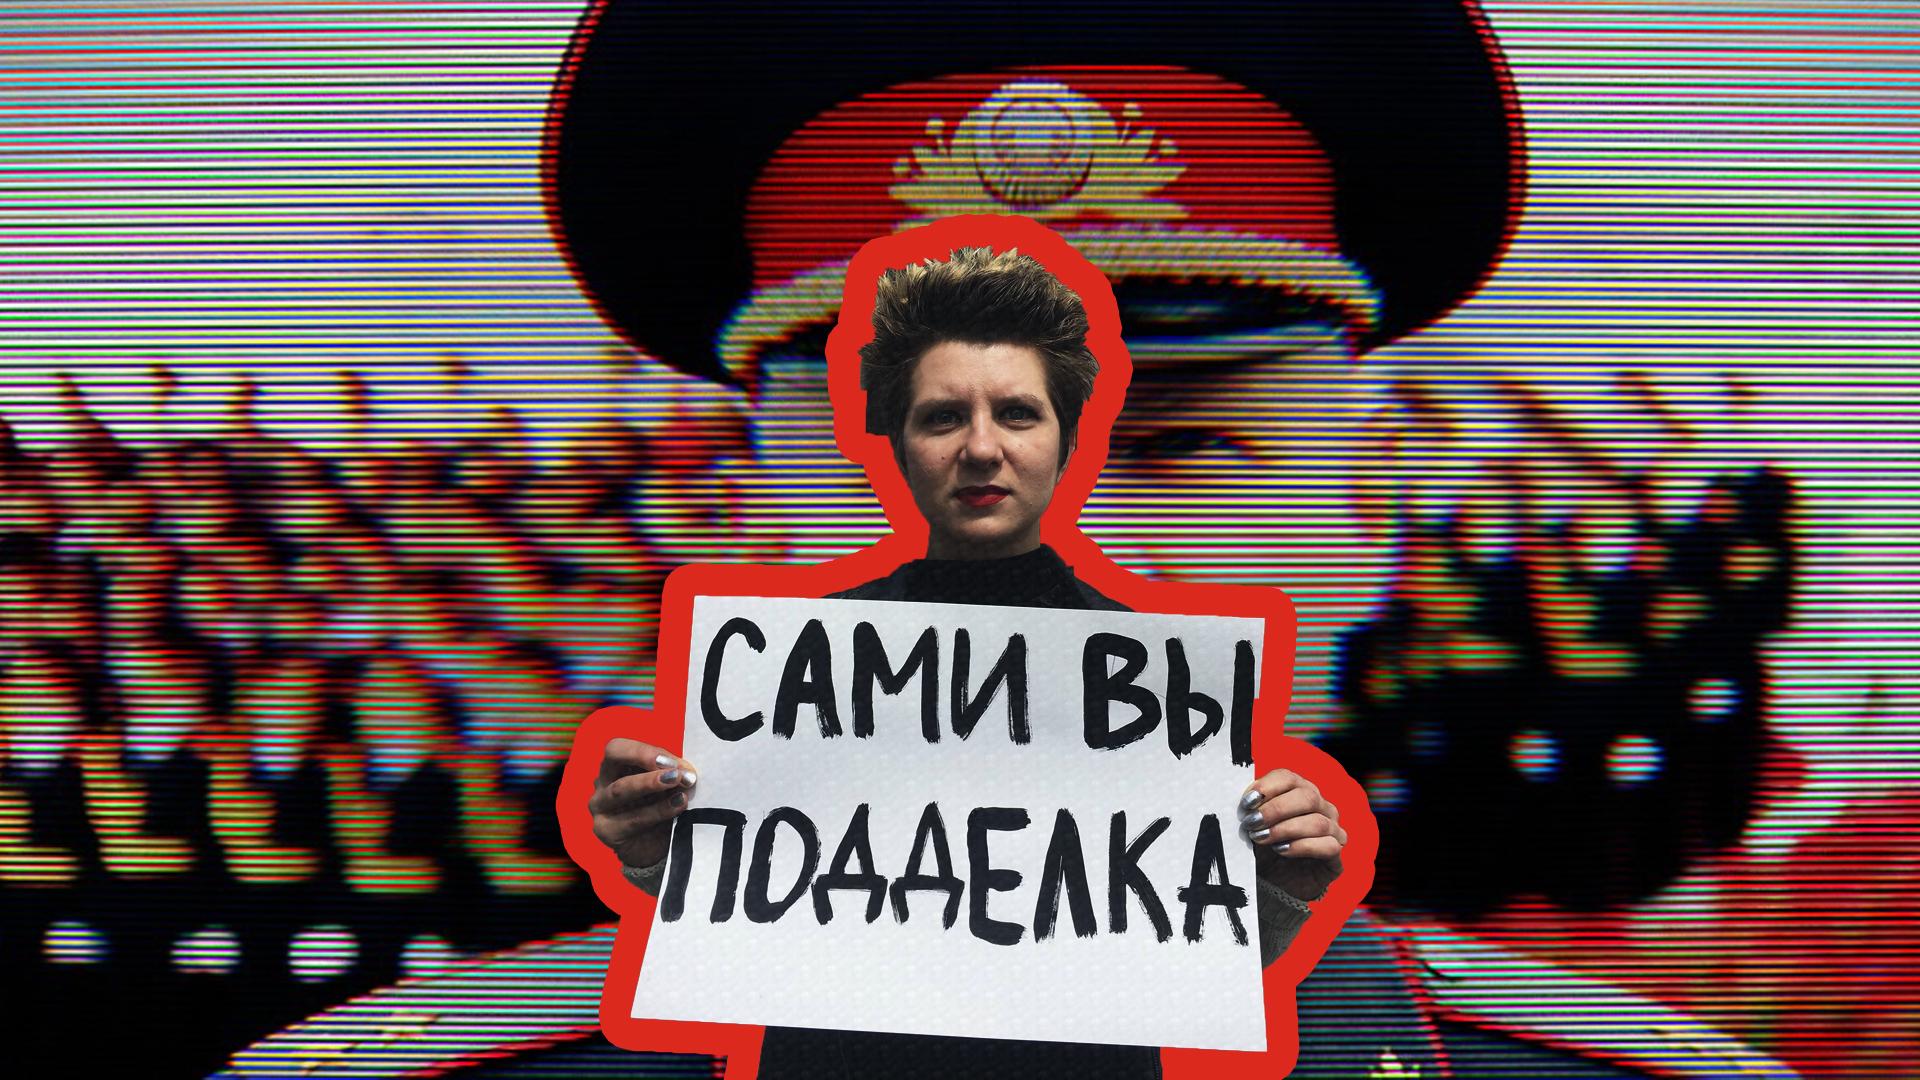 Асцярожна, Біран: размова з самай вядомай ЛГБТК-актывісткай Беларусі прама зараз